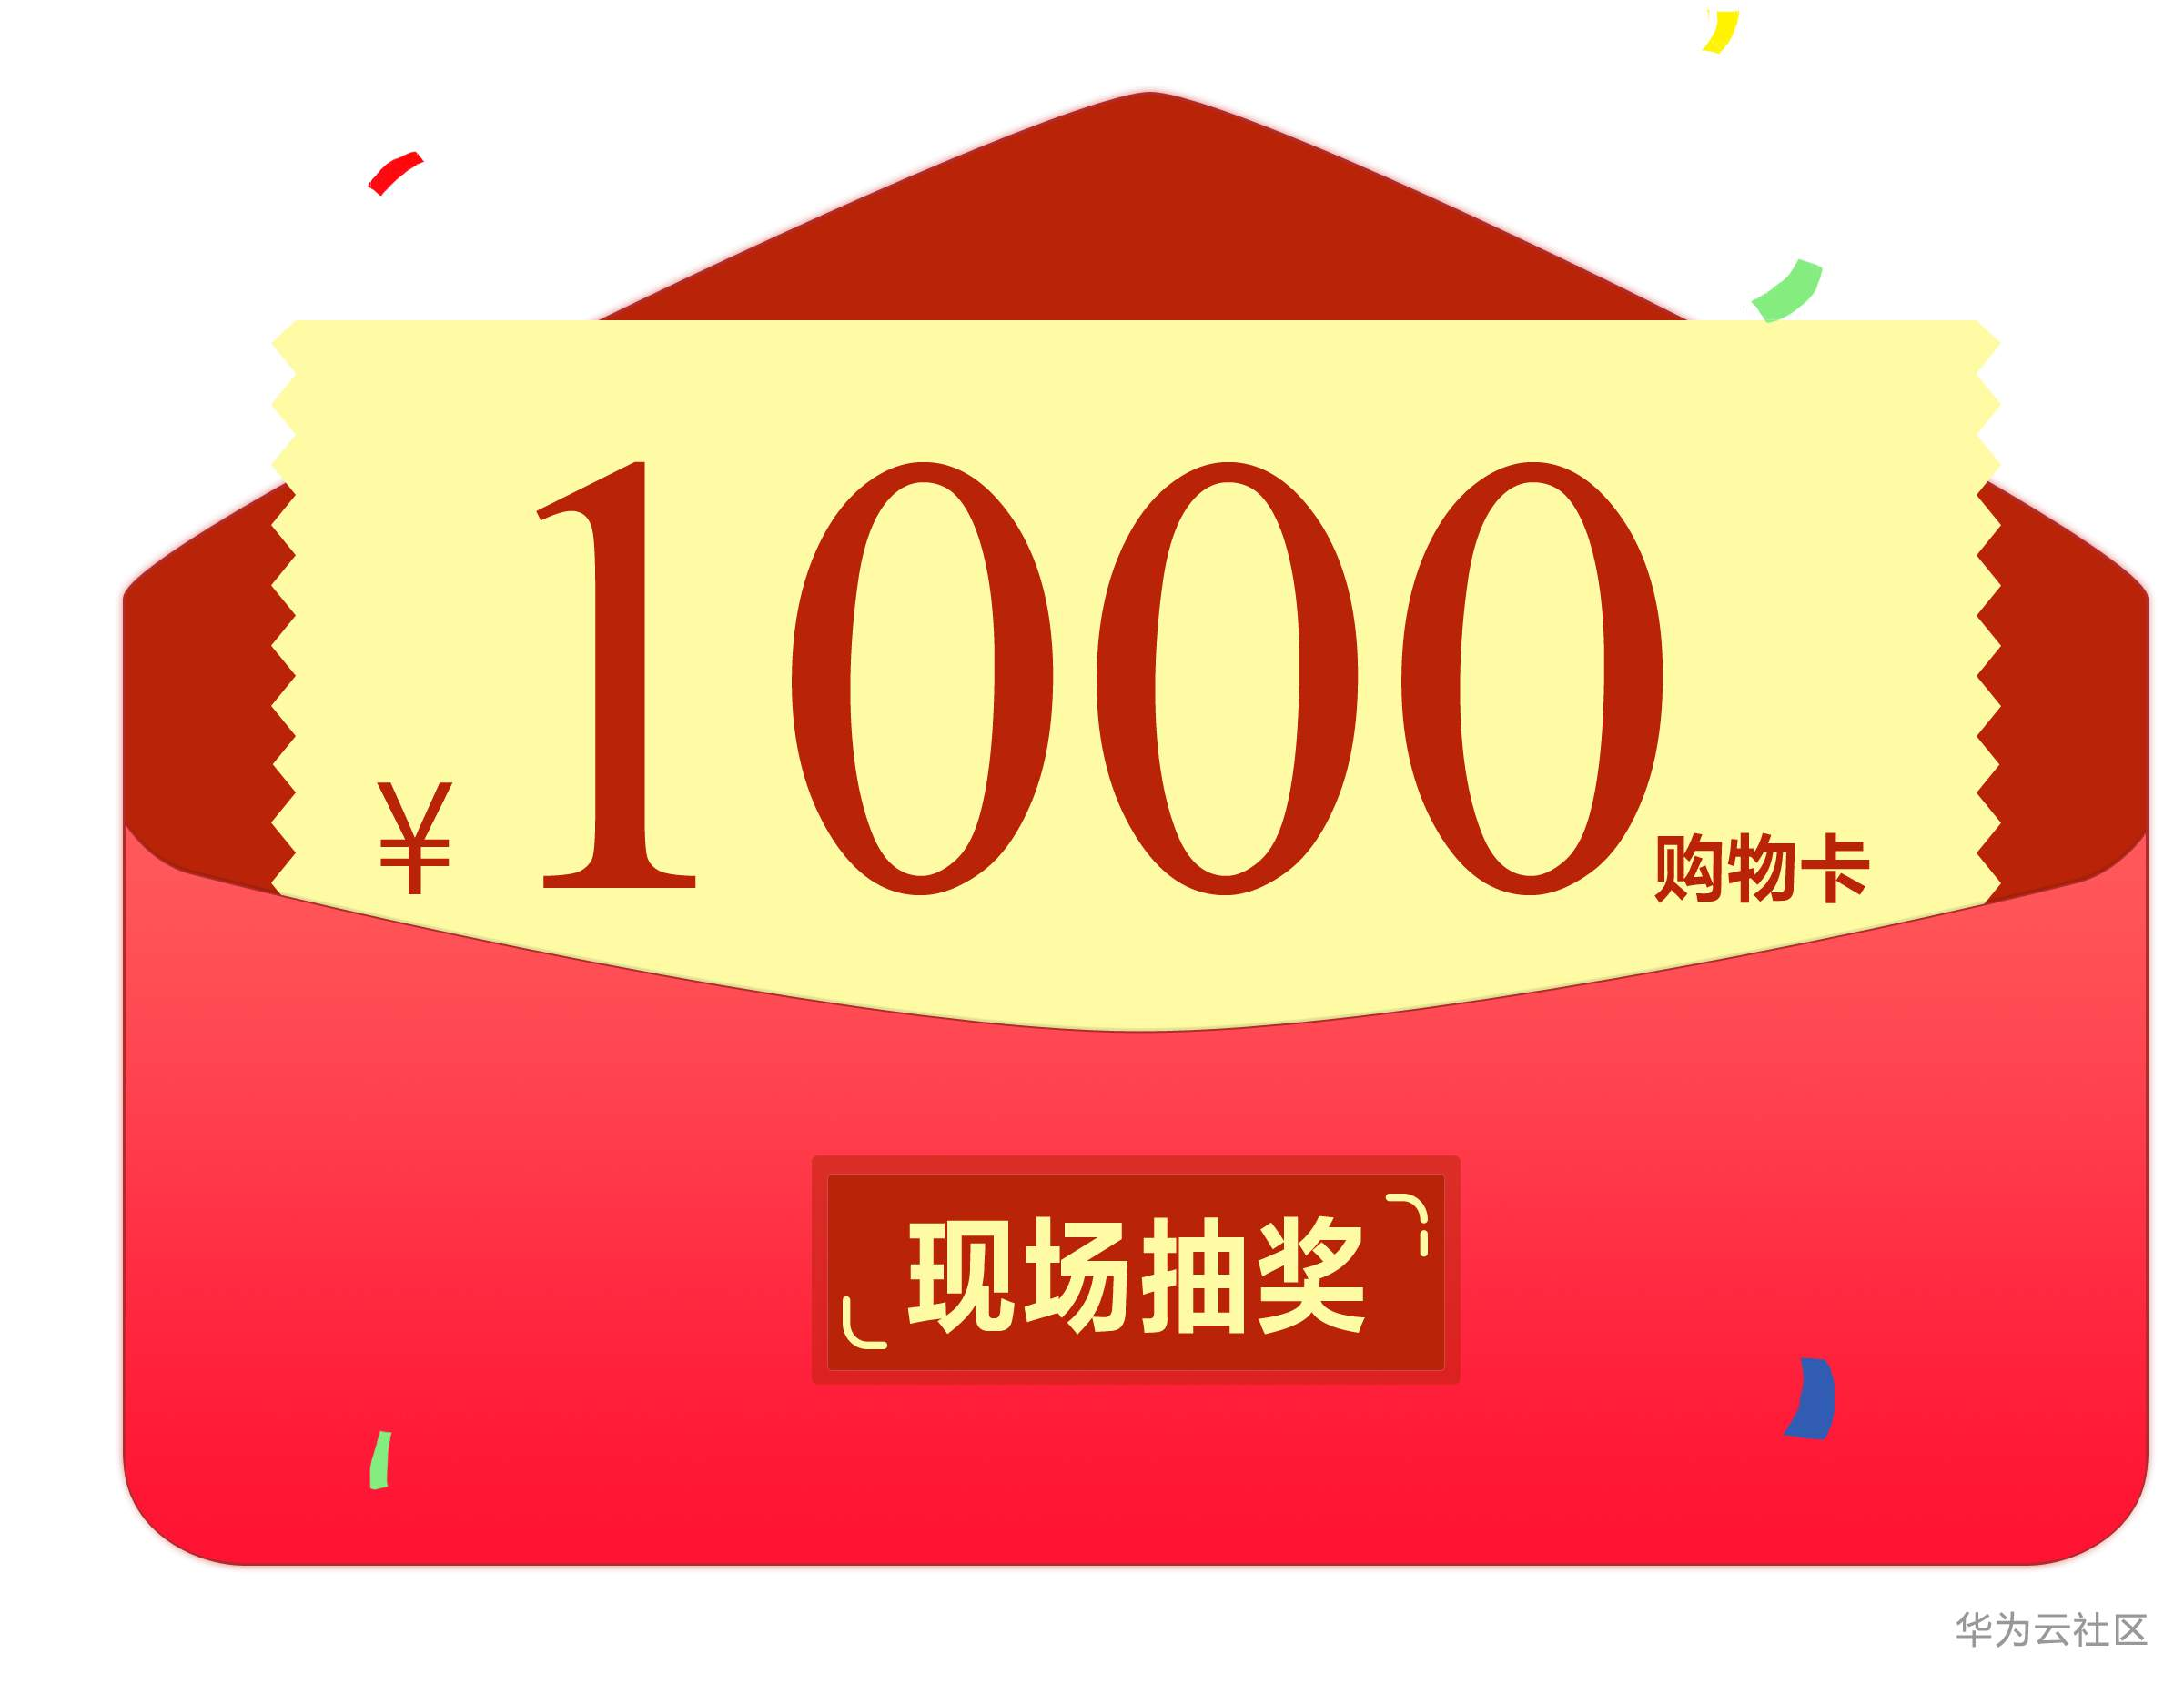 1000购物卡.png